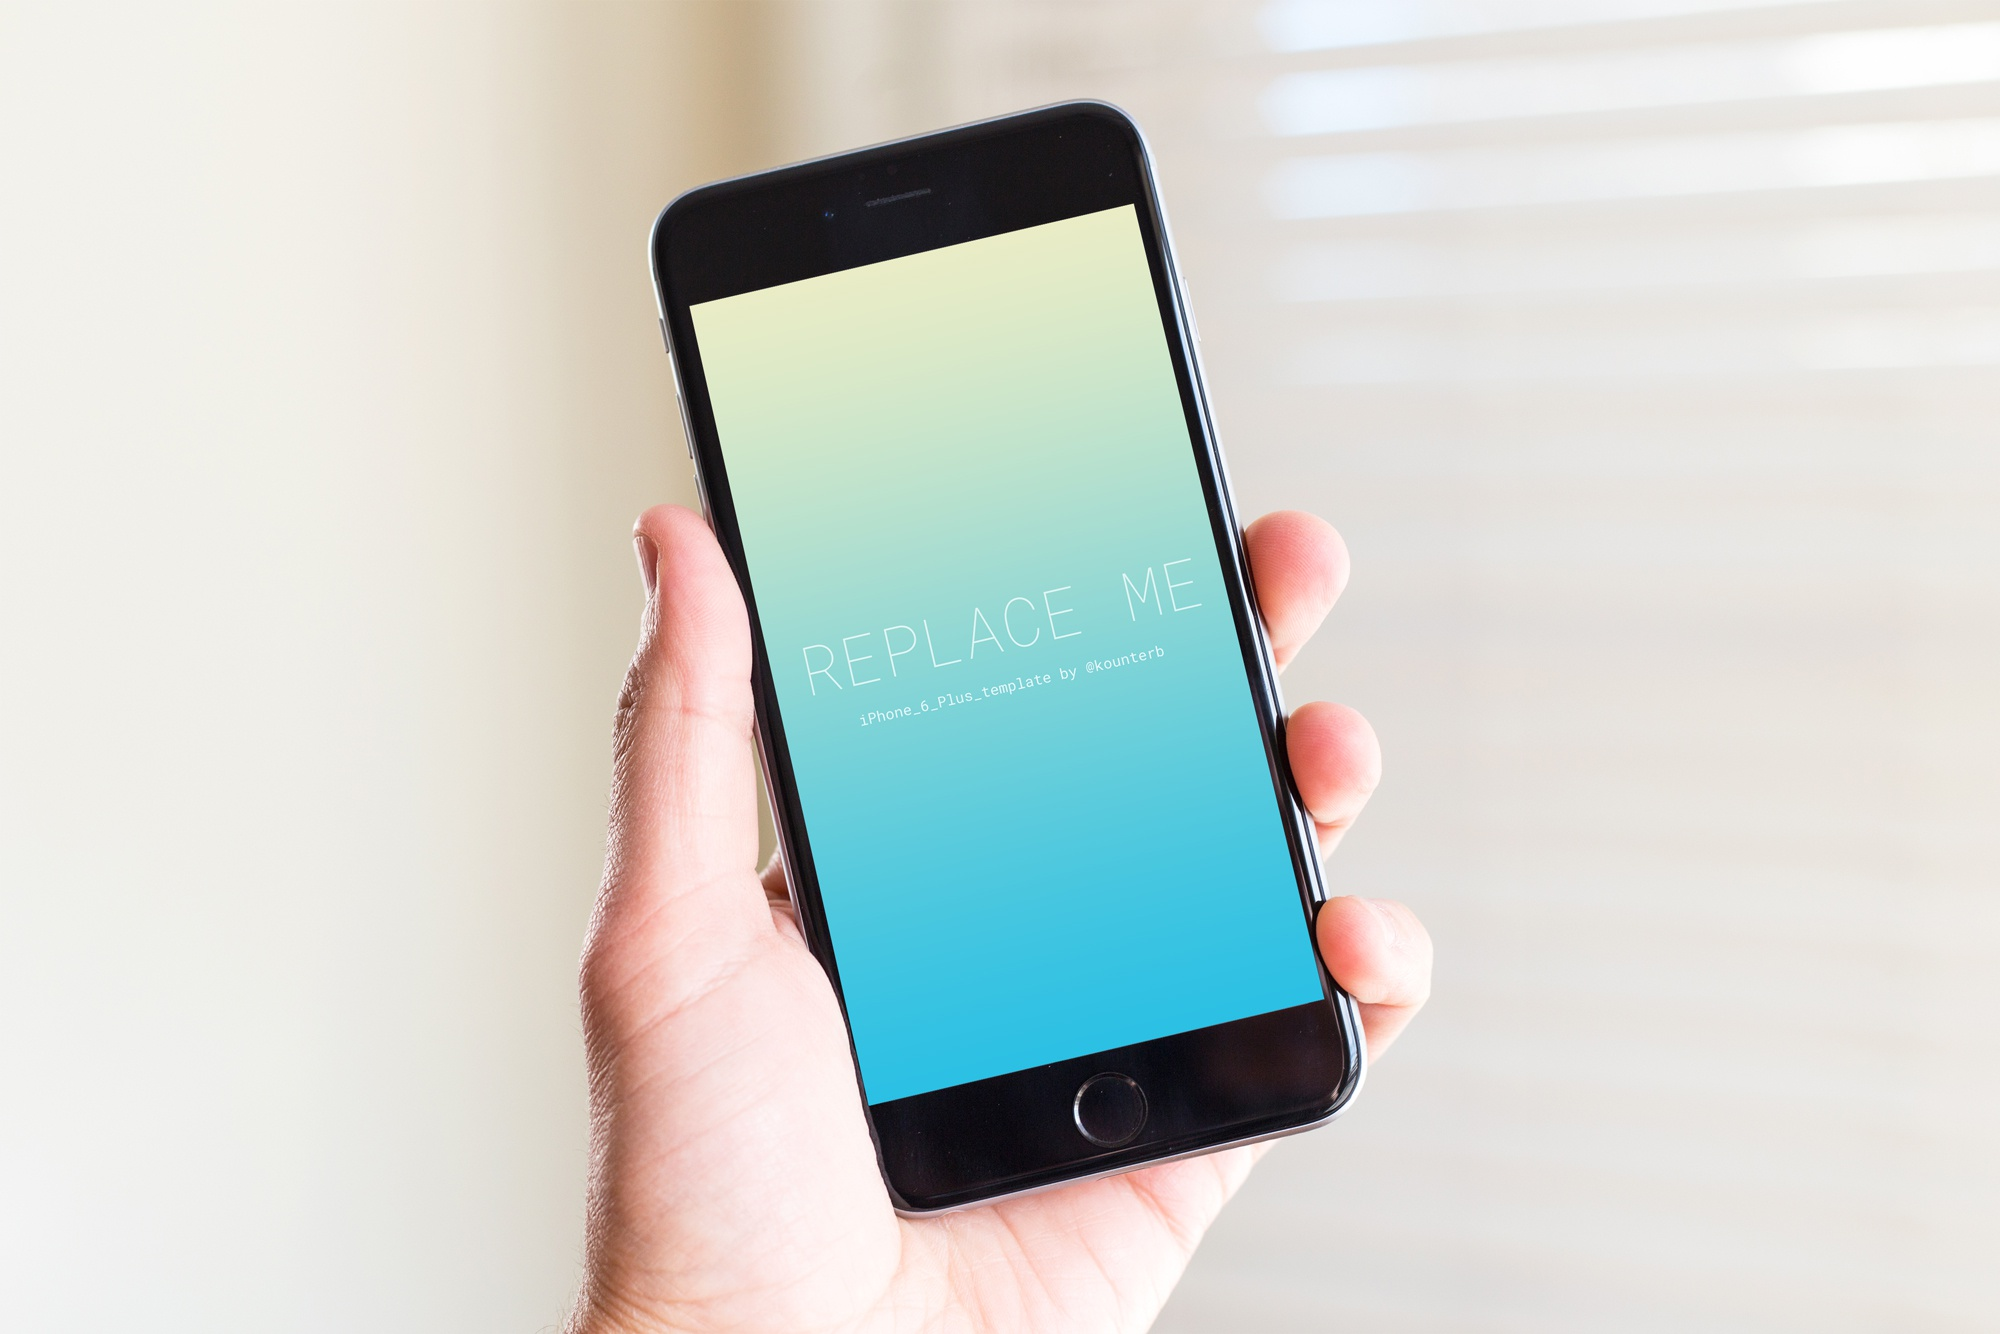 Iphone 6 plus template